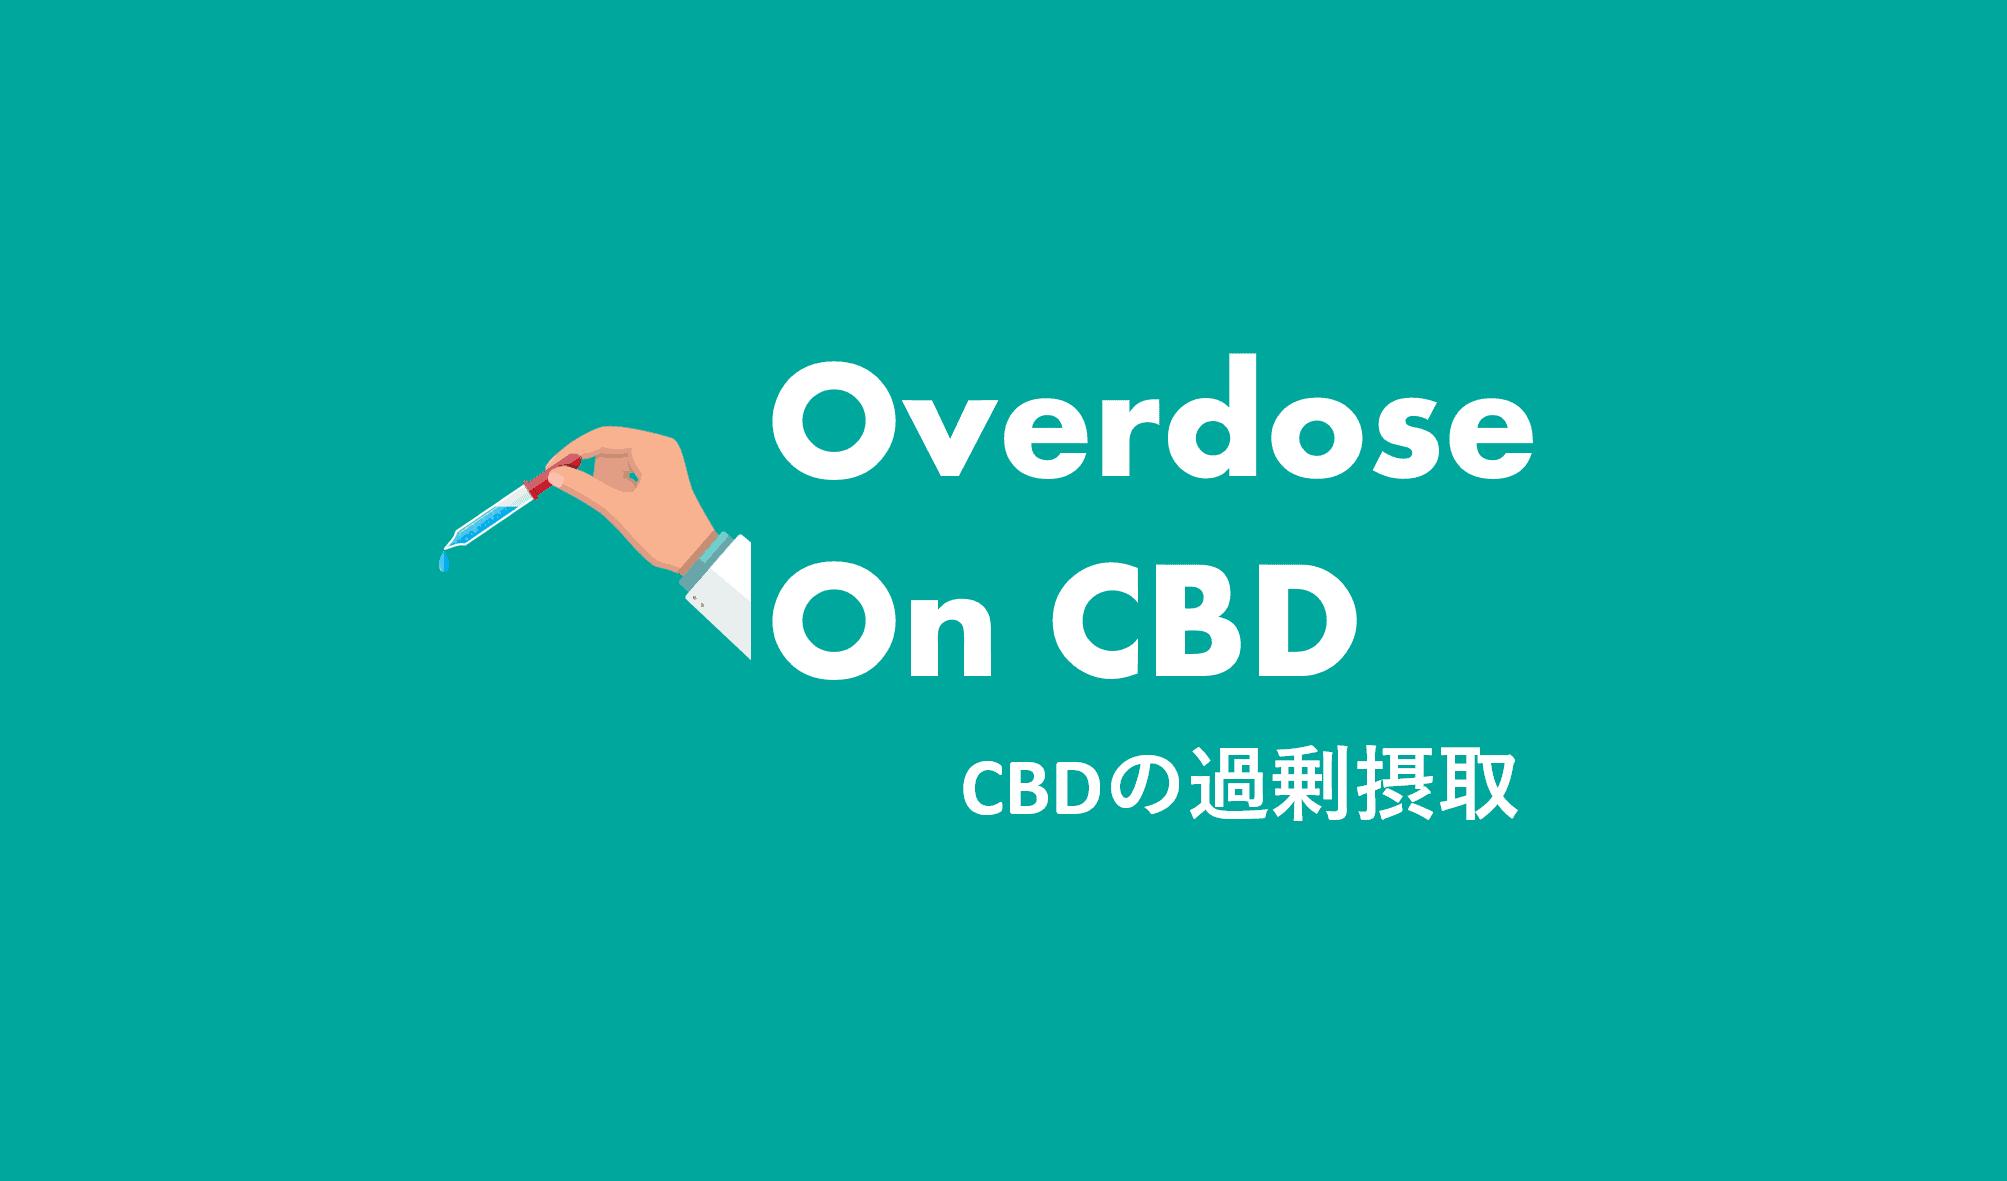 CBDオイルの過剰摂取・とりすぎ